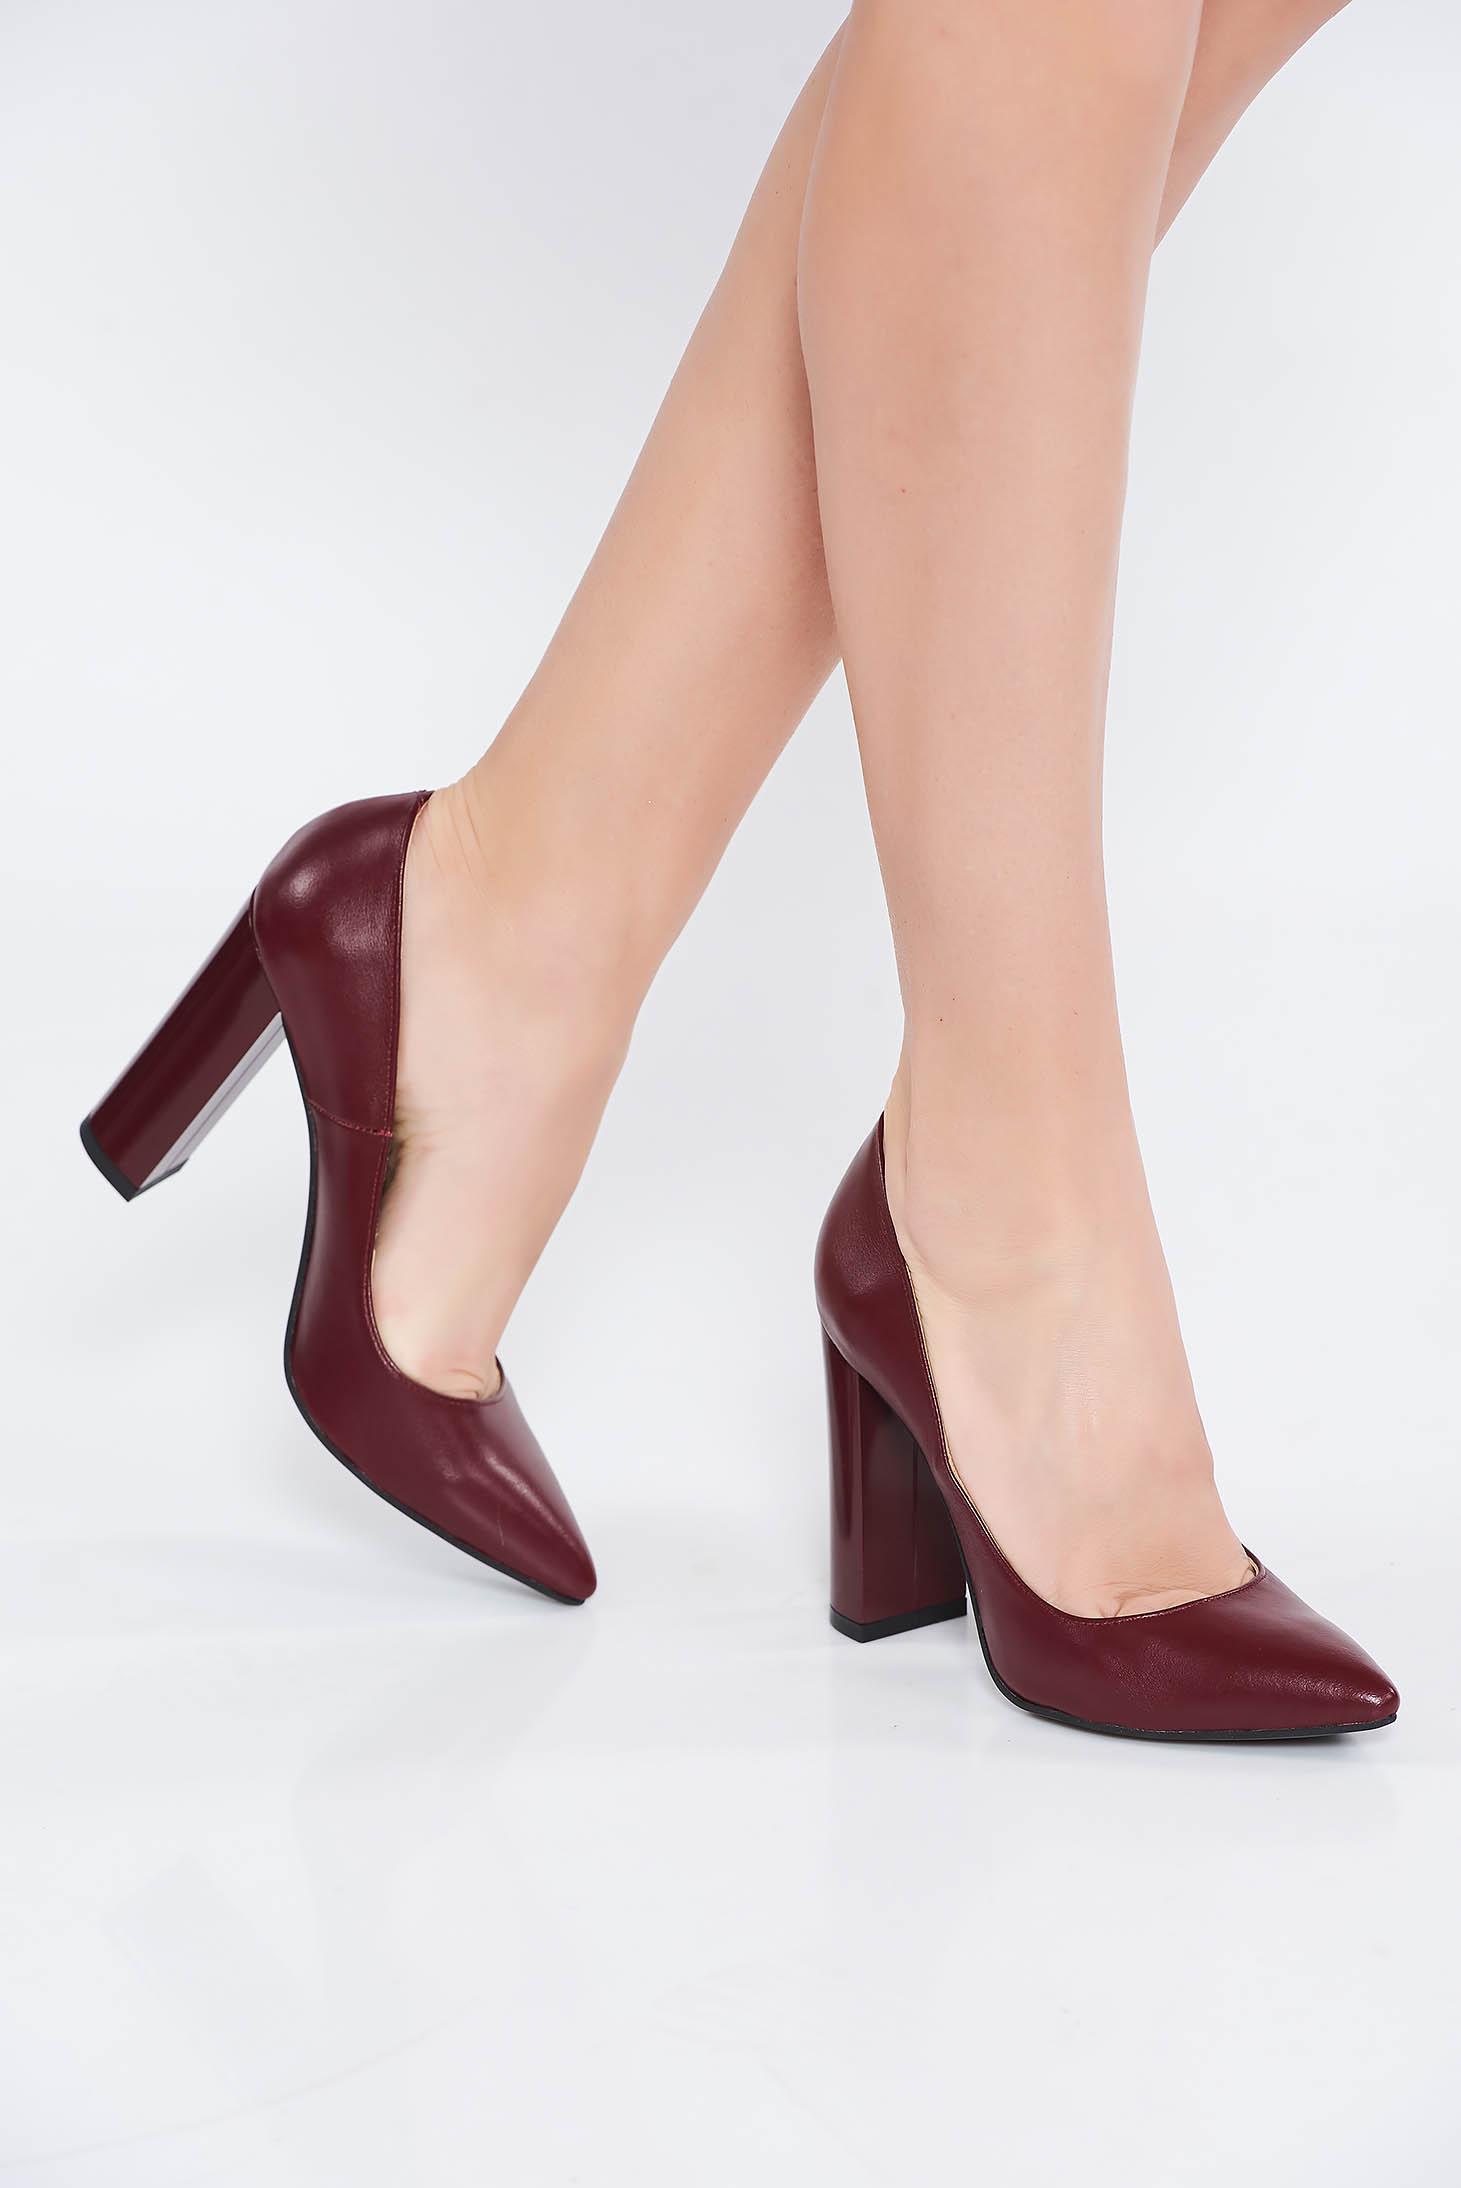 Pantofi visiniu office din piele naturala cu toc gros si varful usor ascutit